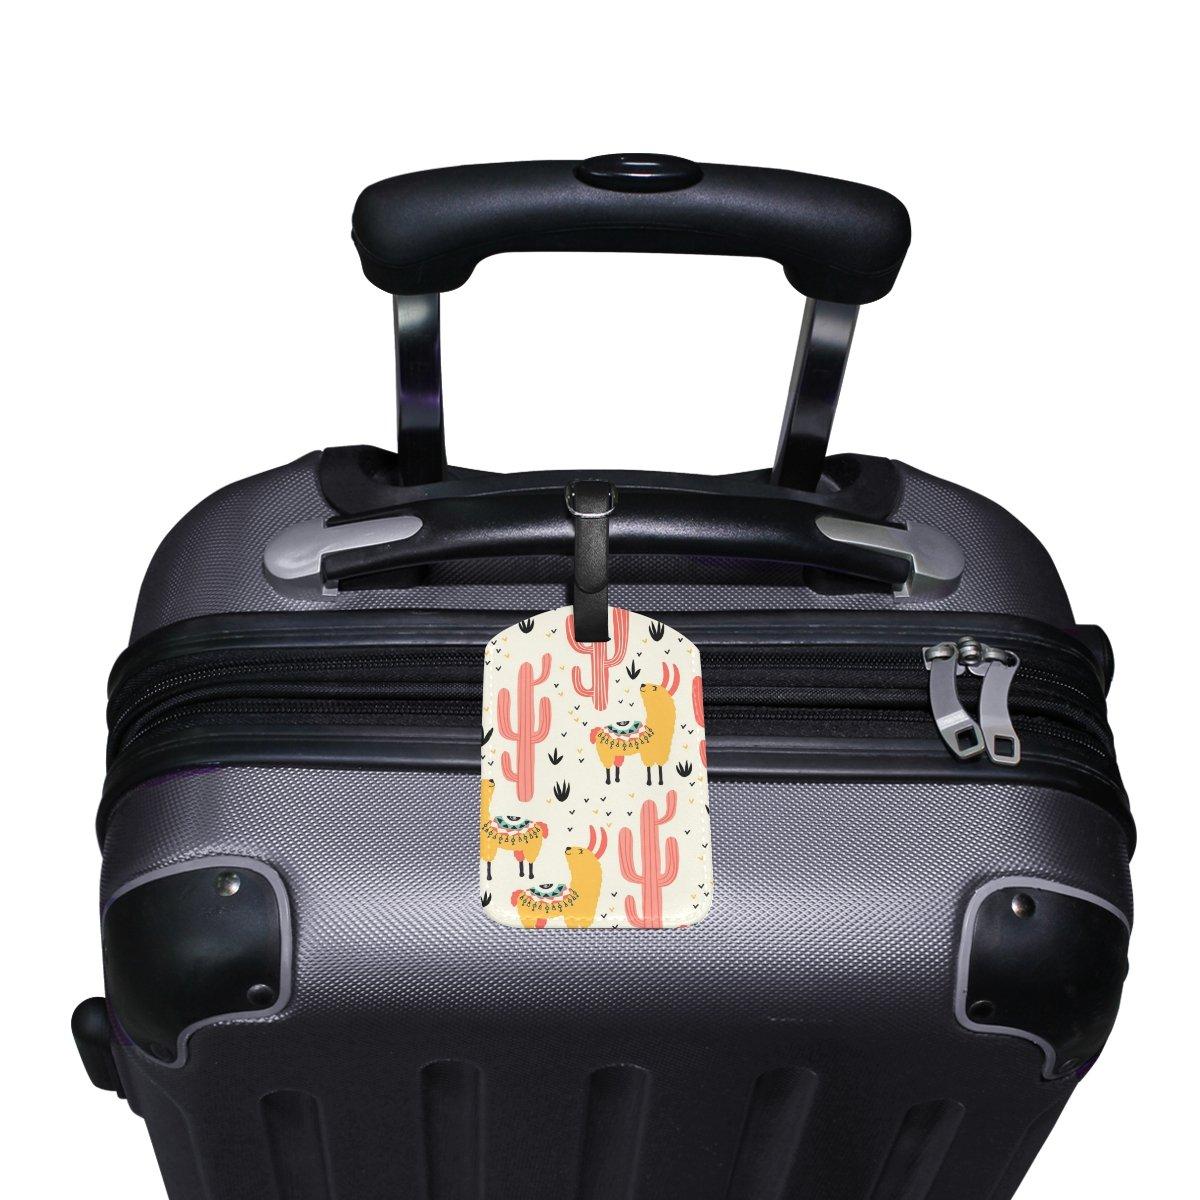 Saobao Travel Luggage Tag Yellow Llamas Red Cacti PU Leather Baggage Travel ID